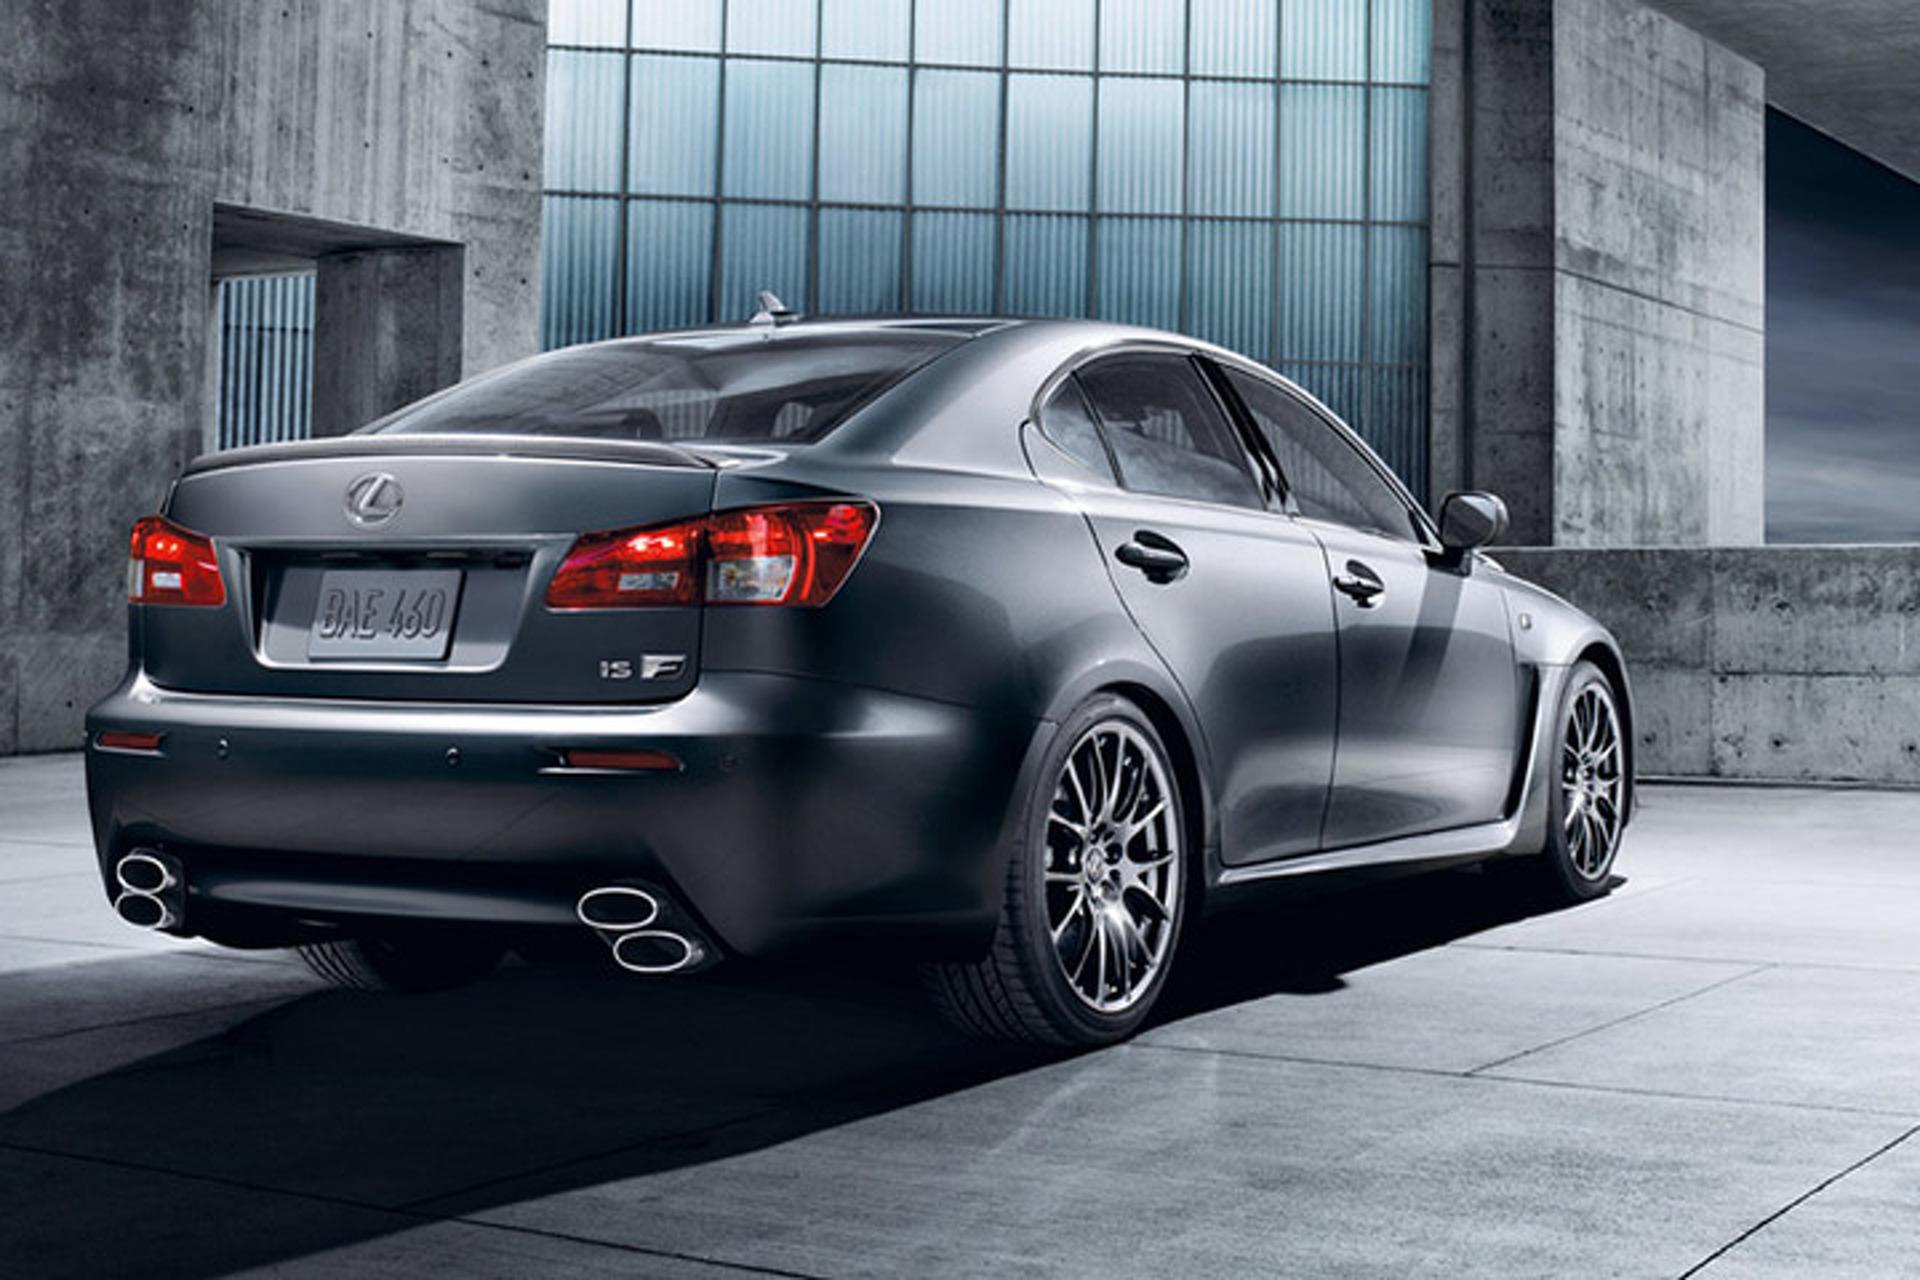 Lexus F Series Won't Add Hybrids, Yet